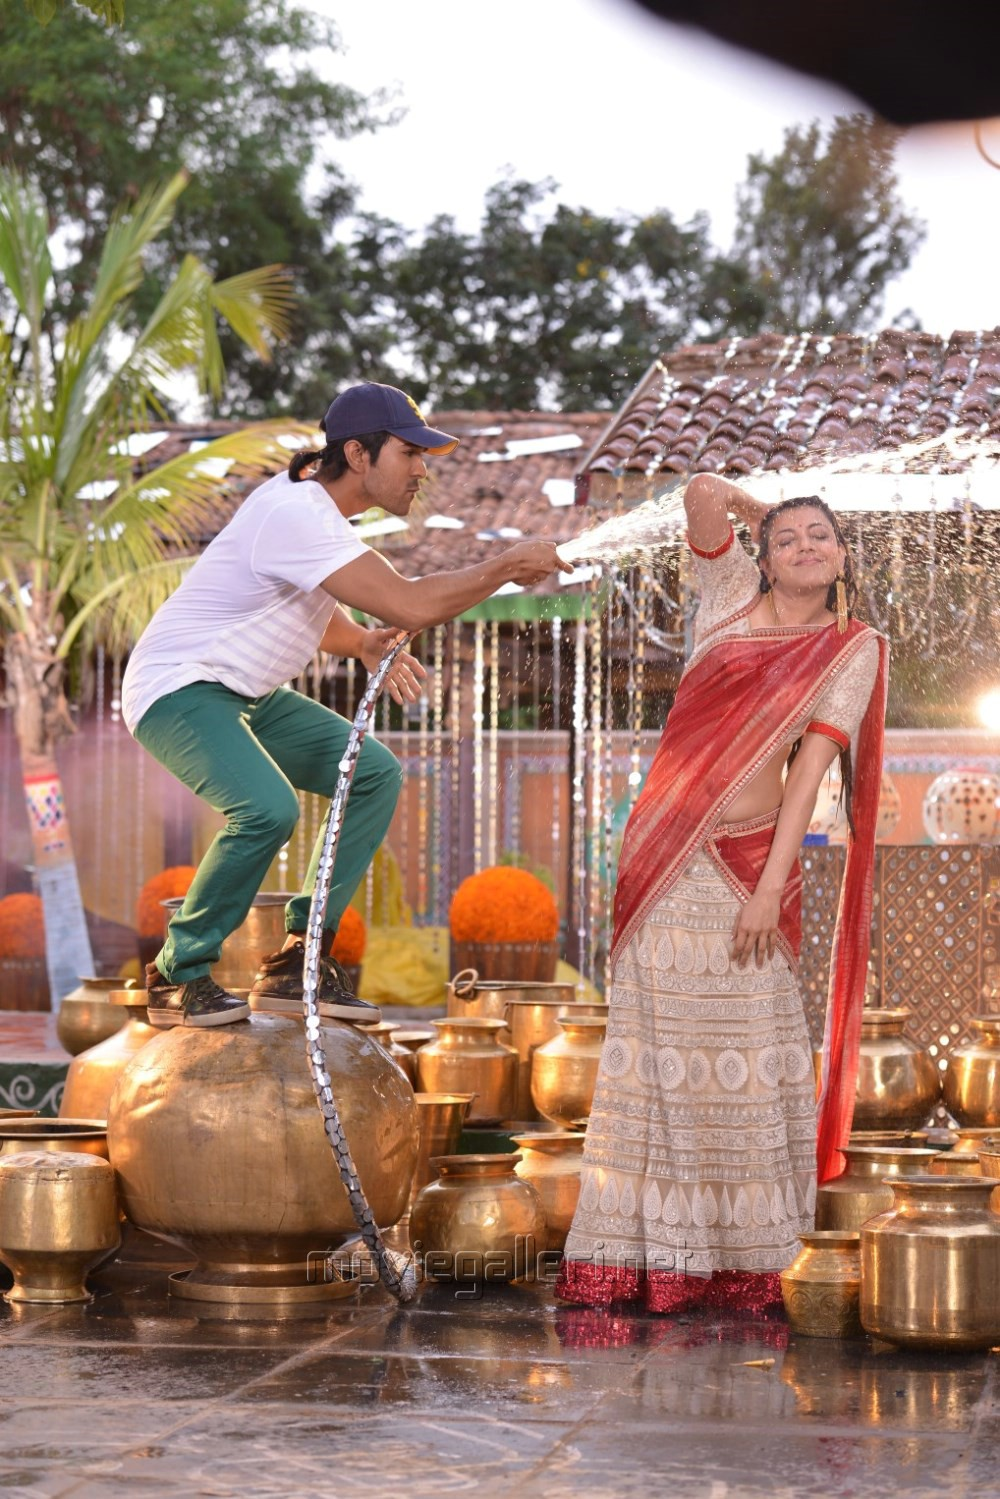 Ram Charan, Kajal Agarwal in Ram Leela Tamil Movie Stills